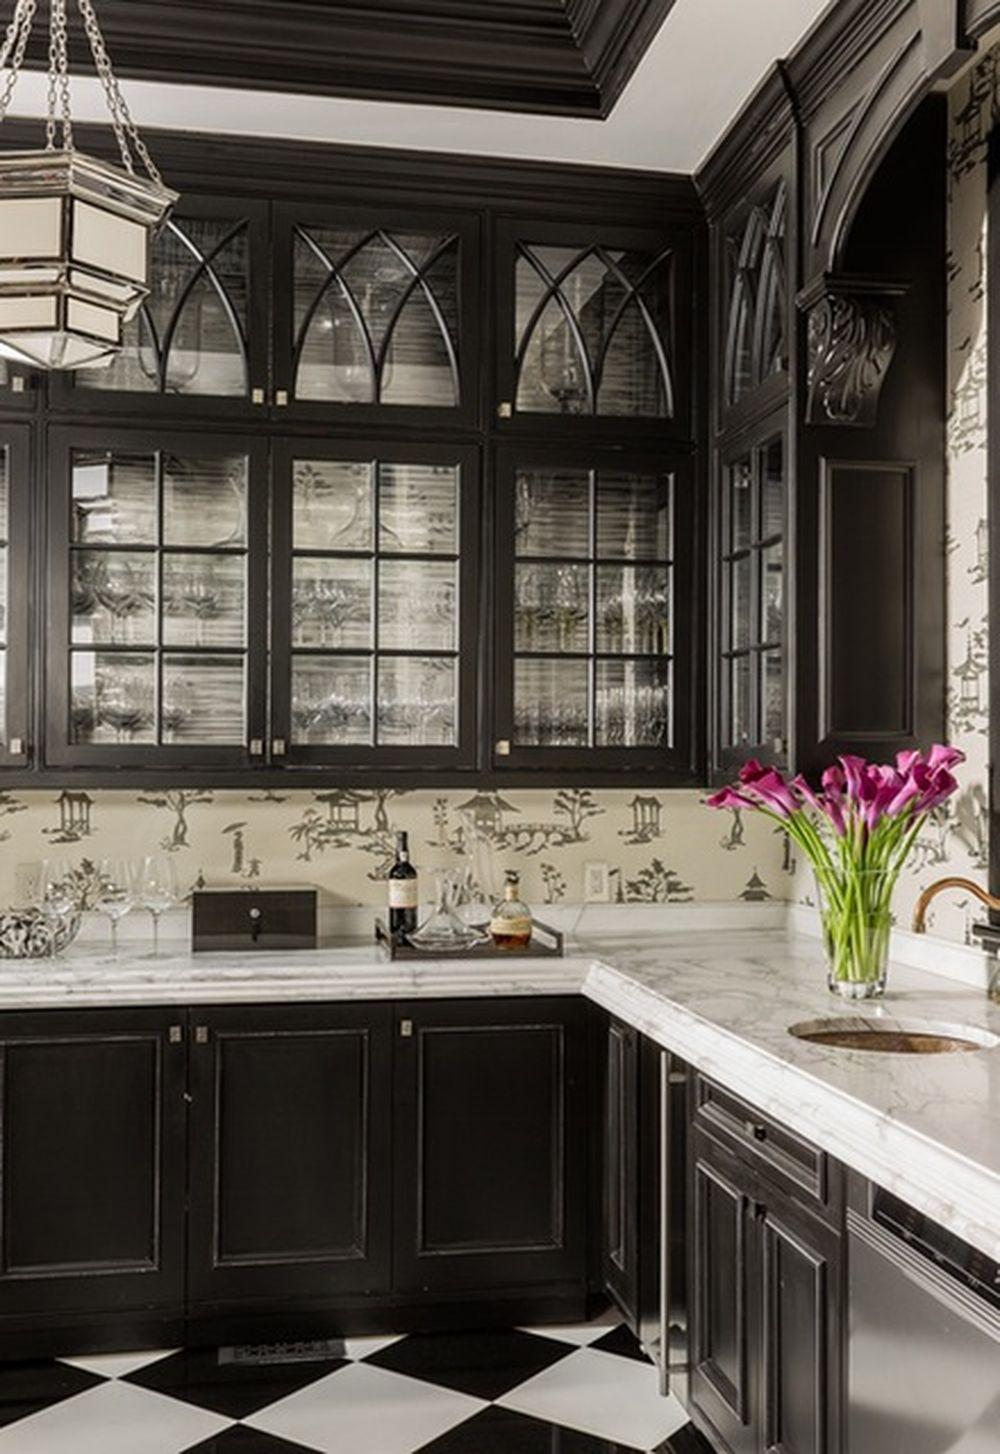 37 Unique kitchen floor design ideas 37